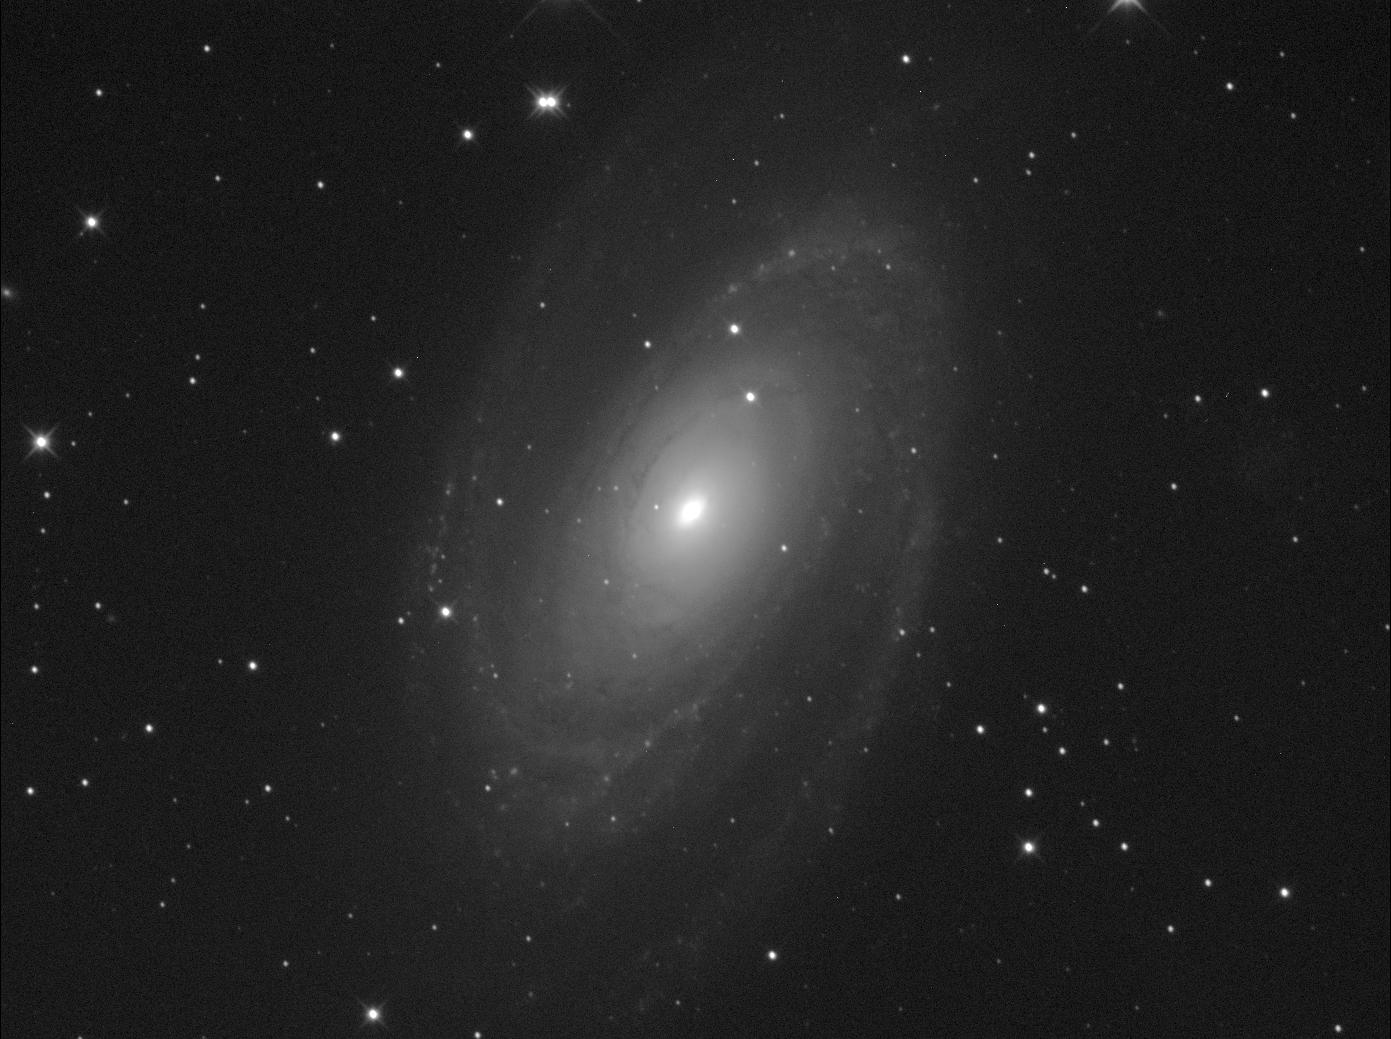 1602195888_Messier81_300sec_1x1__frame8.png.e98d9989b82d588253540c84144ff0eb.png